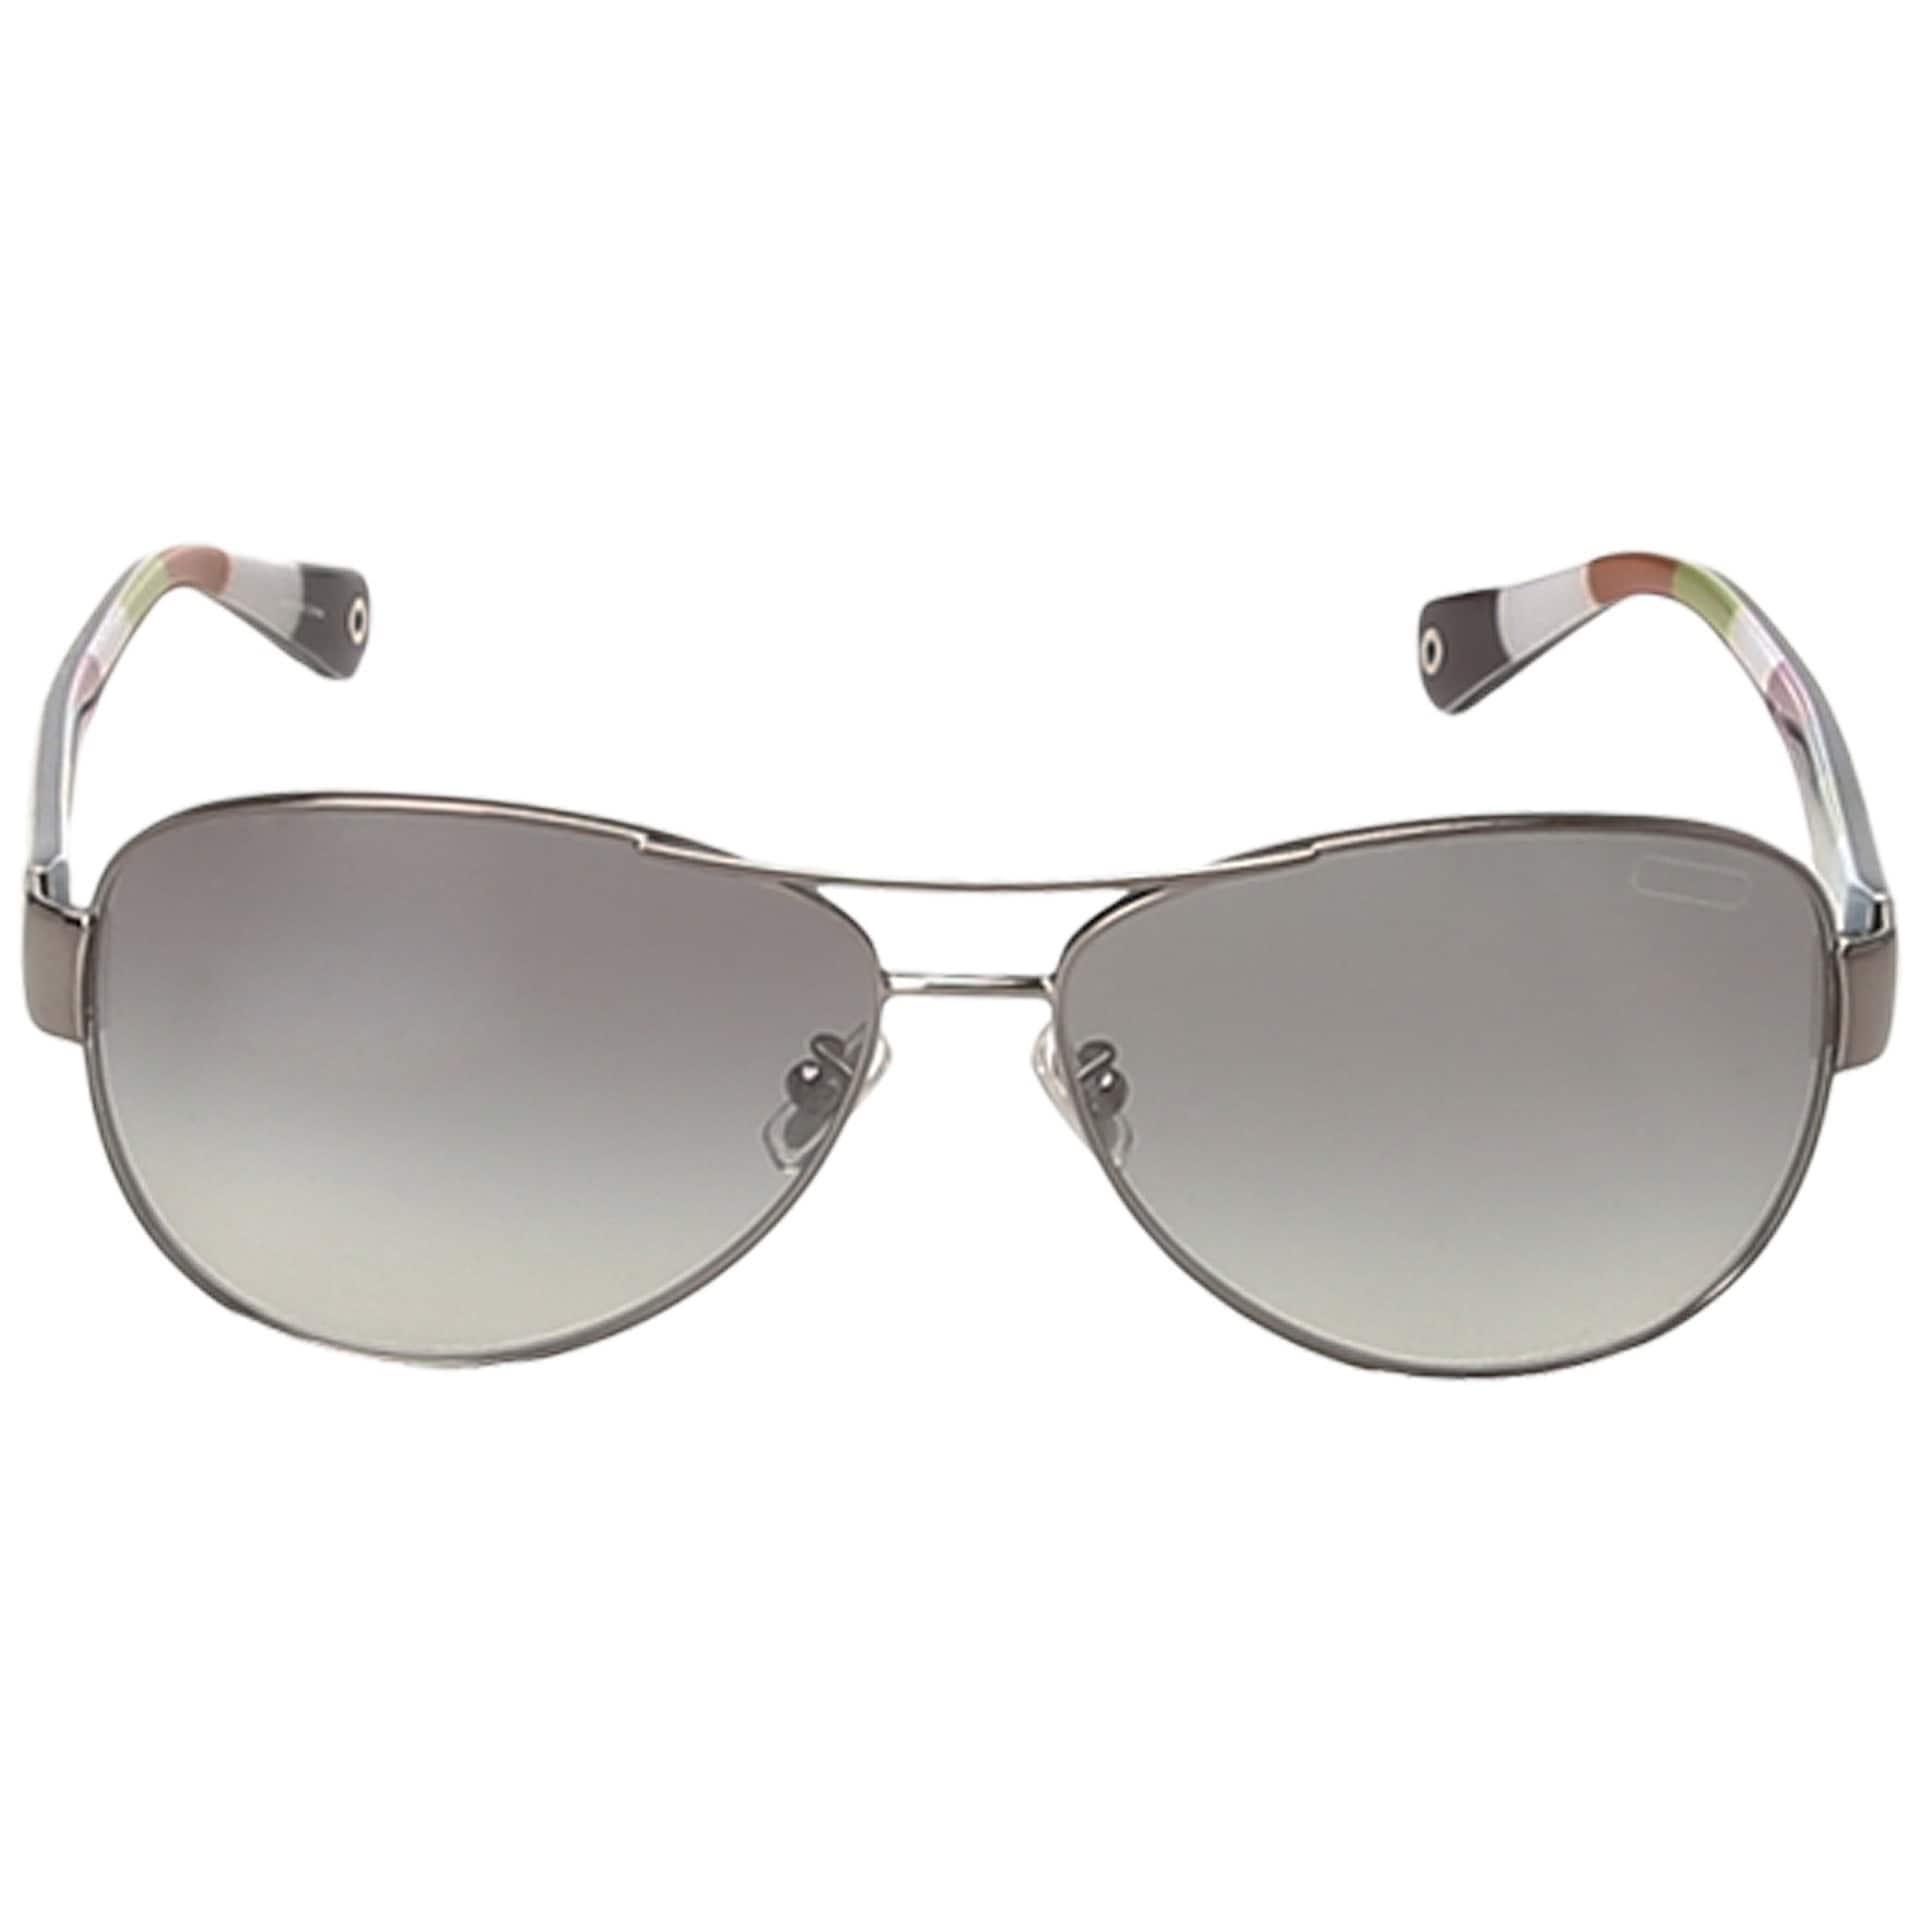 87a2d12b4d05 ... wholesale shop coach womens l012 kristina hc7003 9010t3 metal aviator  polarized sunglasses free shipping today overstock